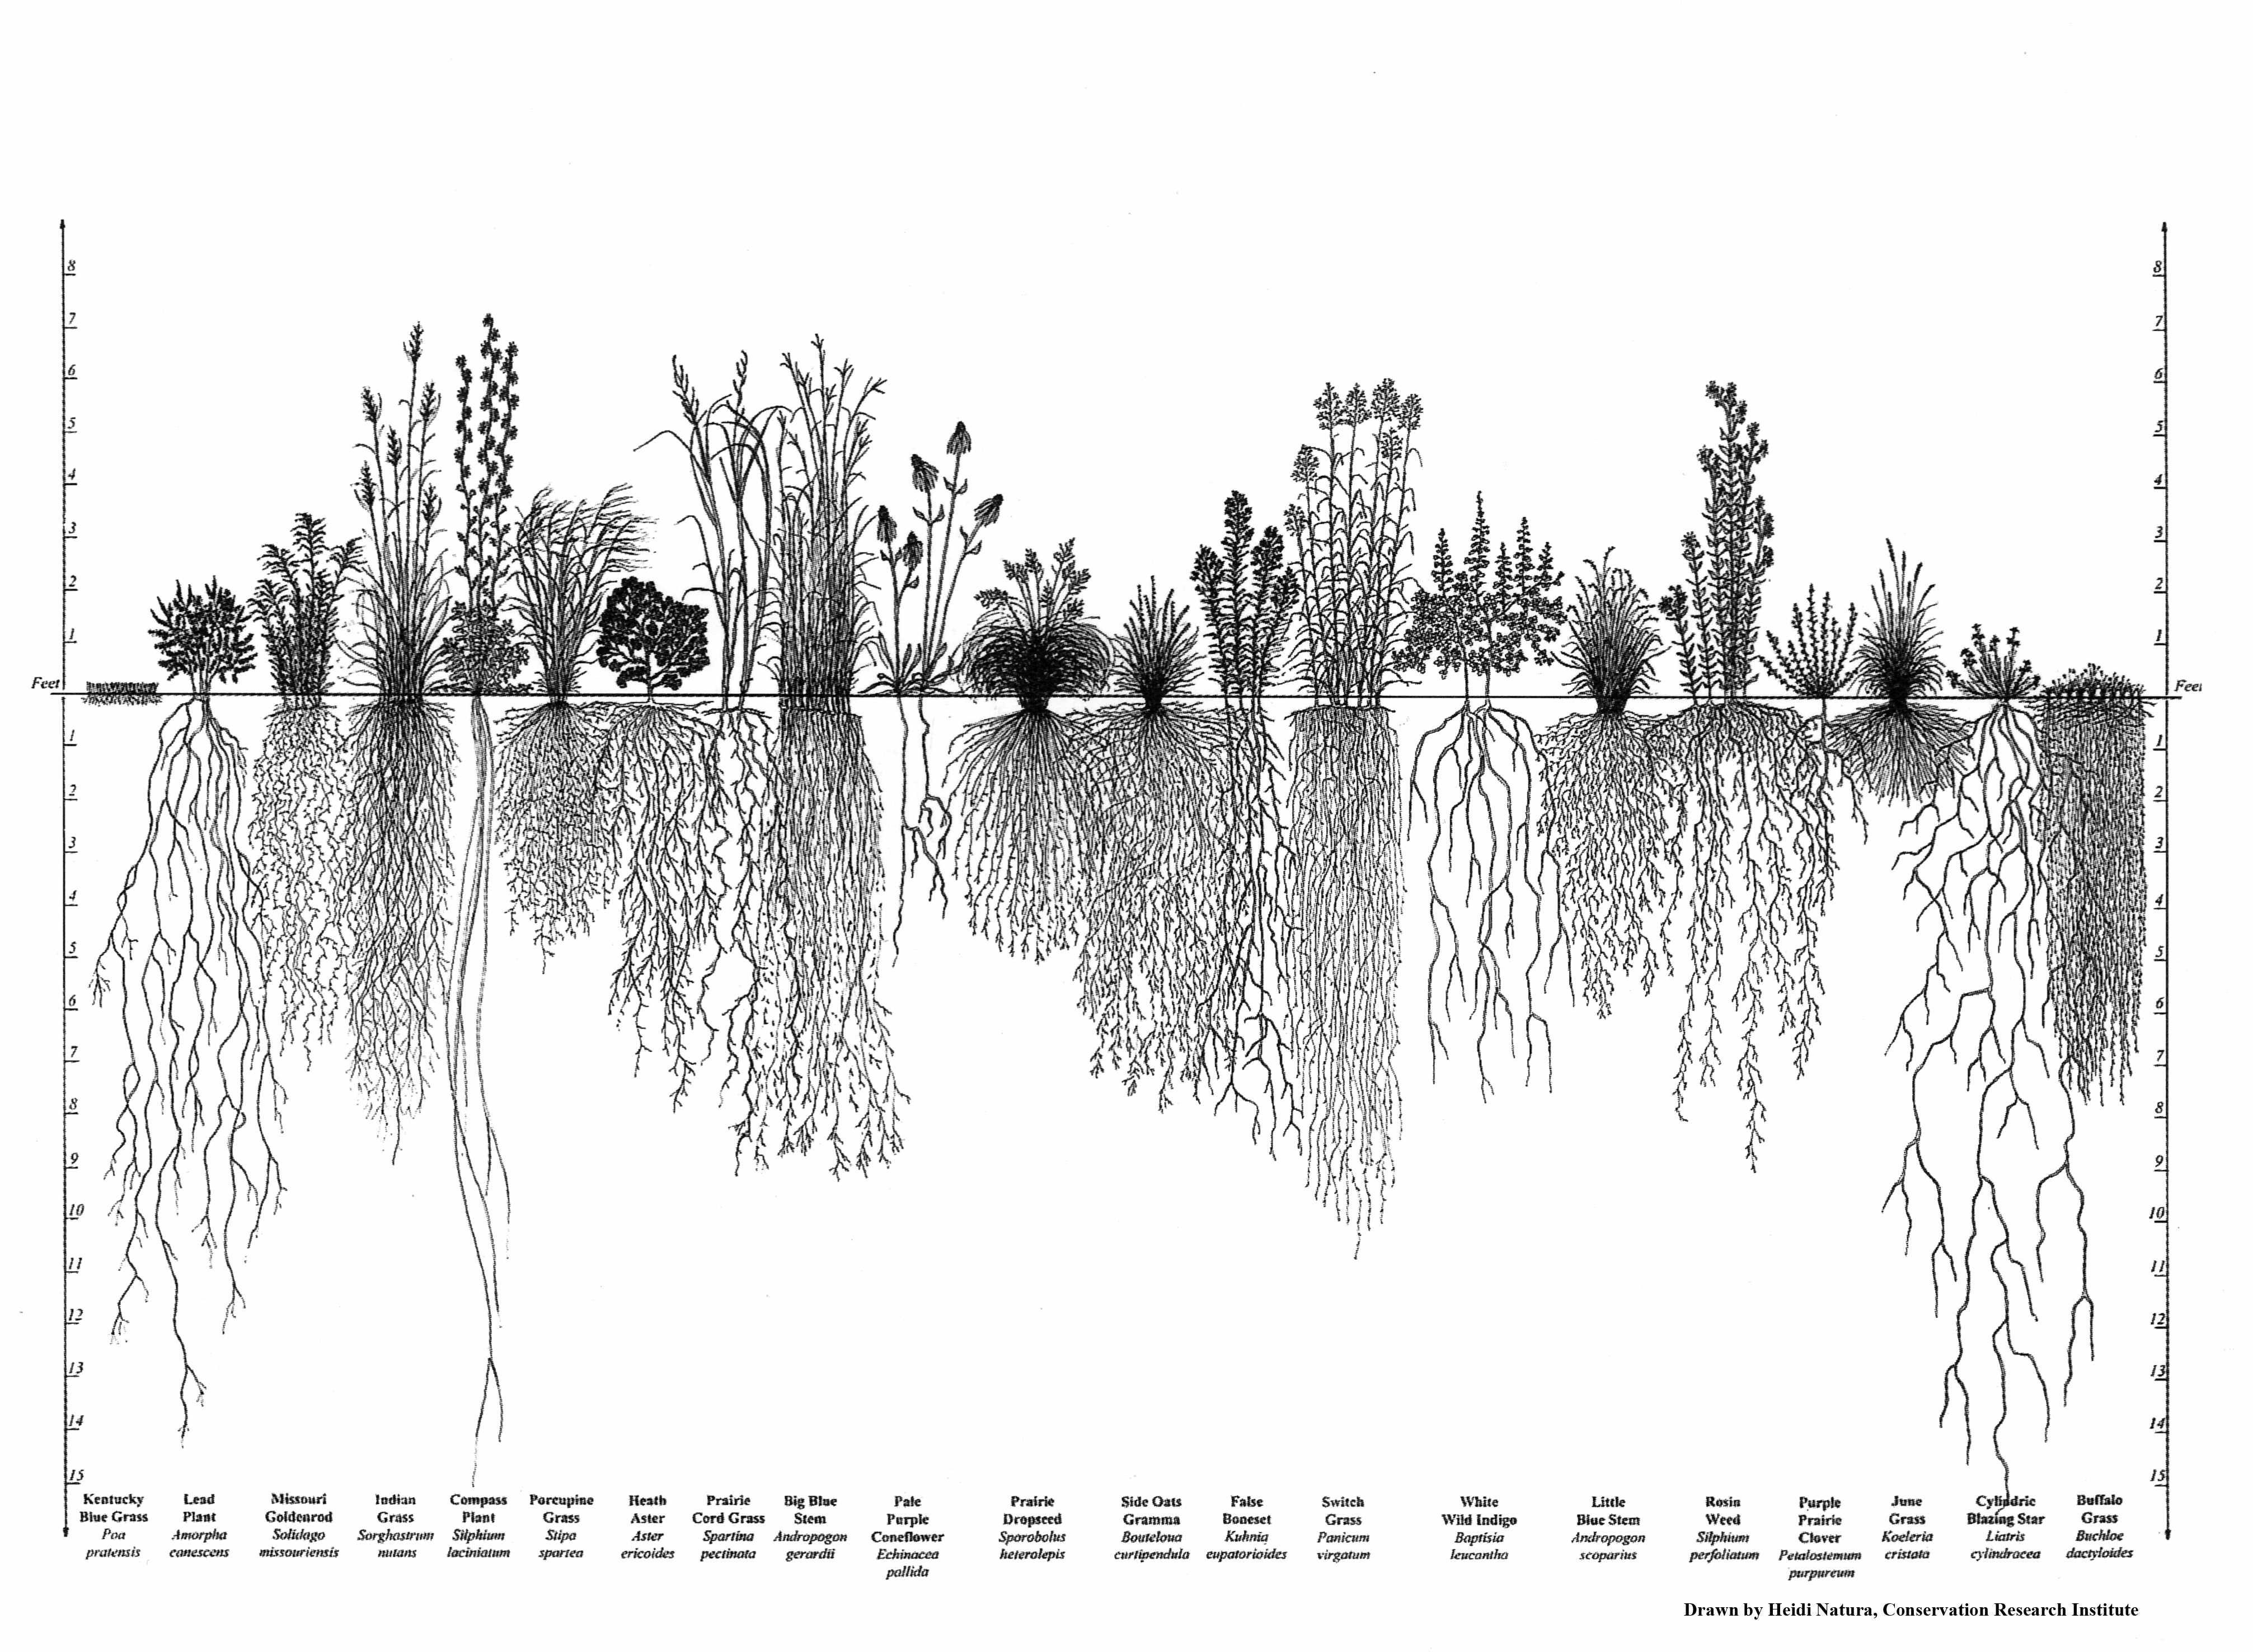 Prairie Grass Roots 2 Credit Small 4 026 2 952 Pixels